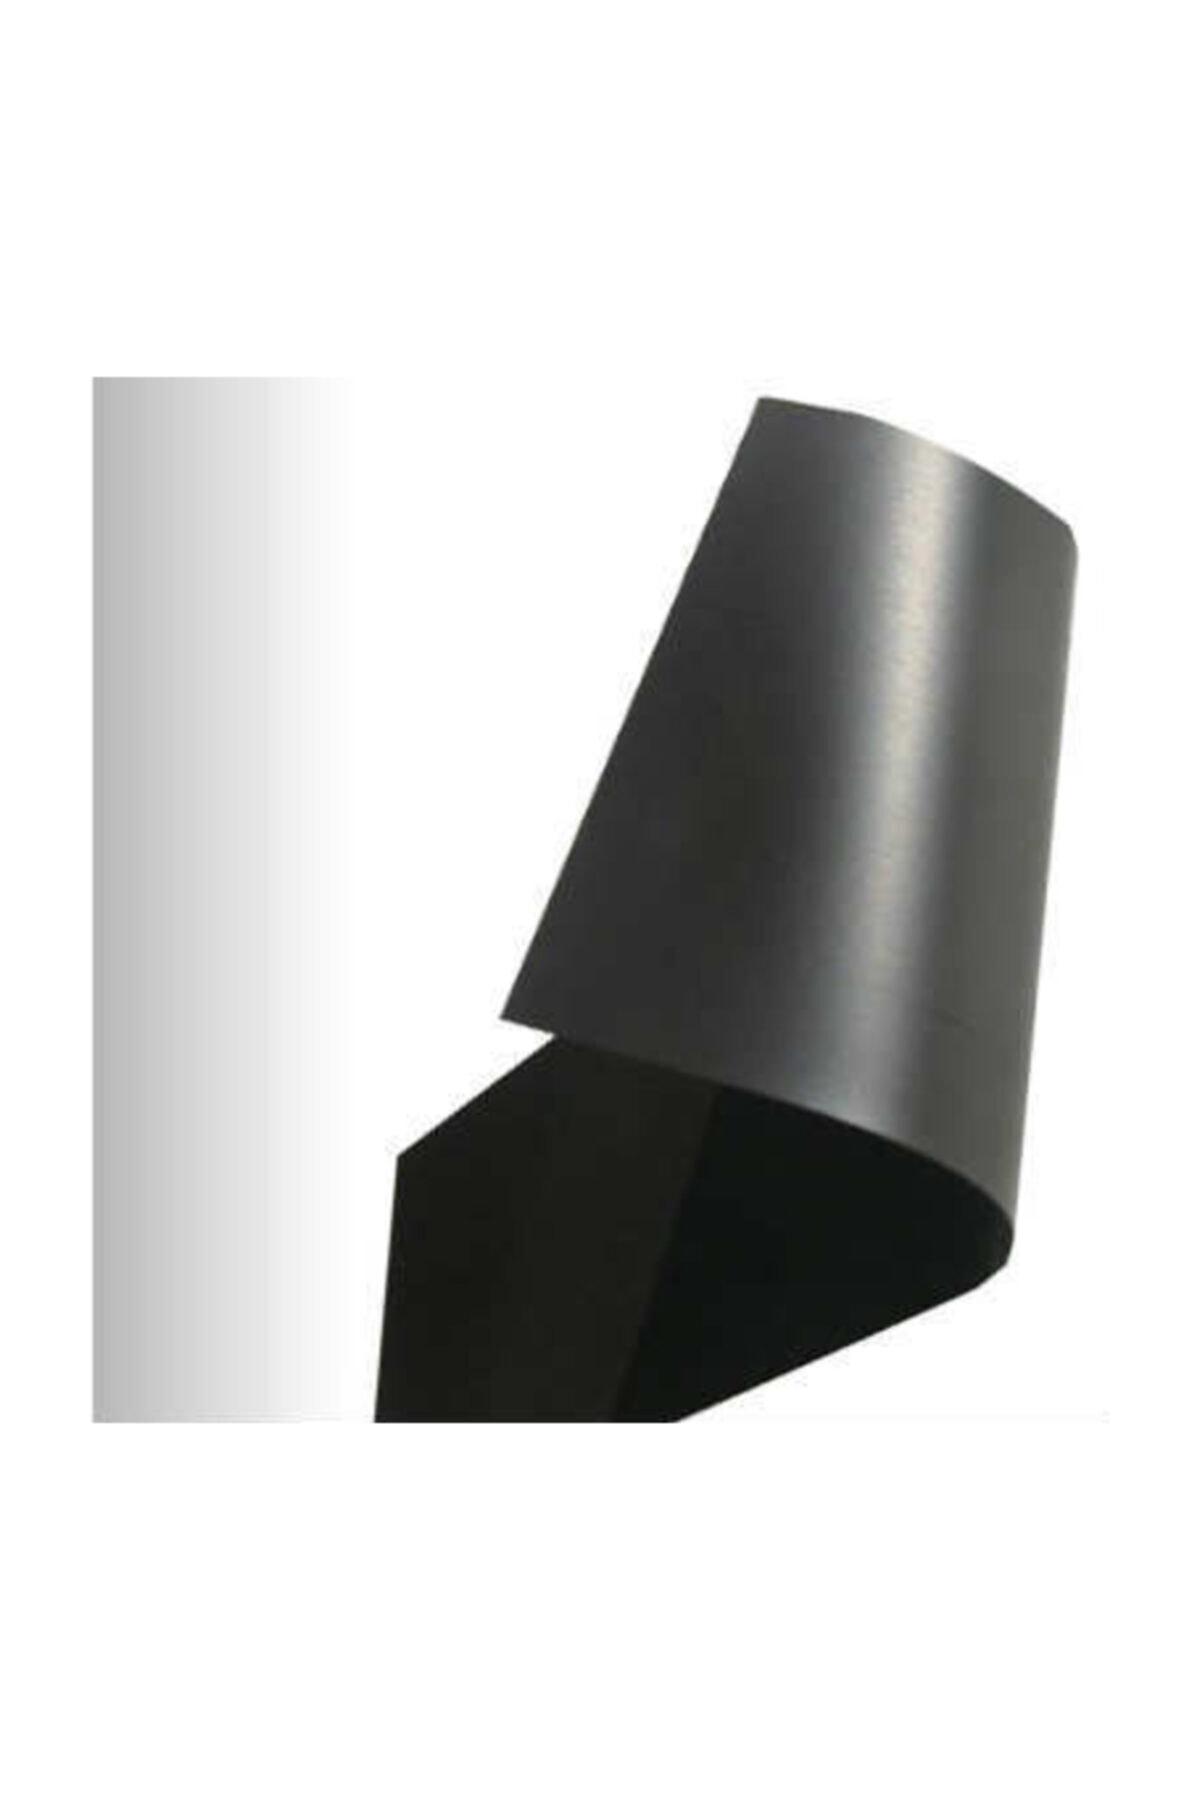 Dünya Magnet Mıknatıs Plaka 70cmx100 Cm - Fotoğraf Magneti, Tabaka Levha Magnet Mıknatıs 1